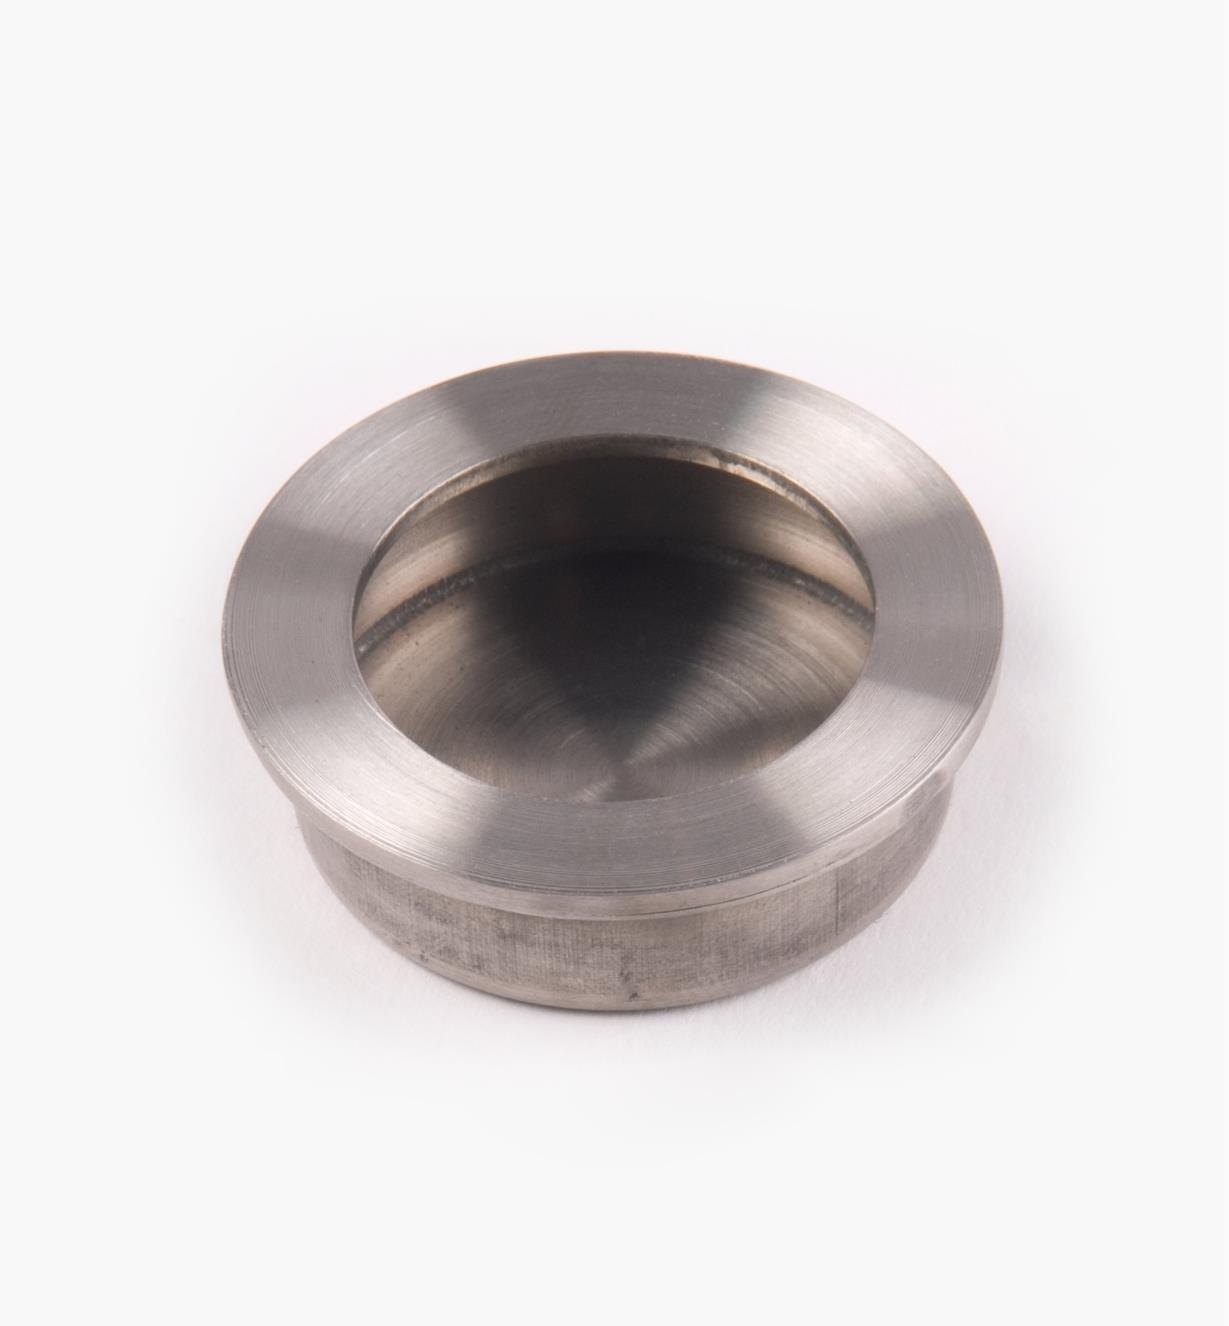 01W7014 - Poignée, 40 mm (35 mm x 10 mm)